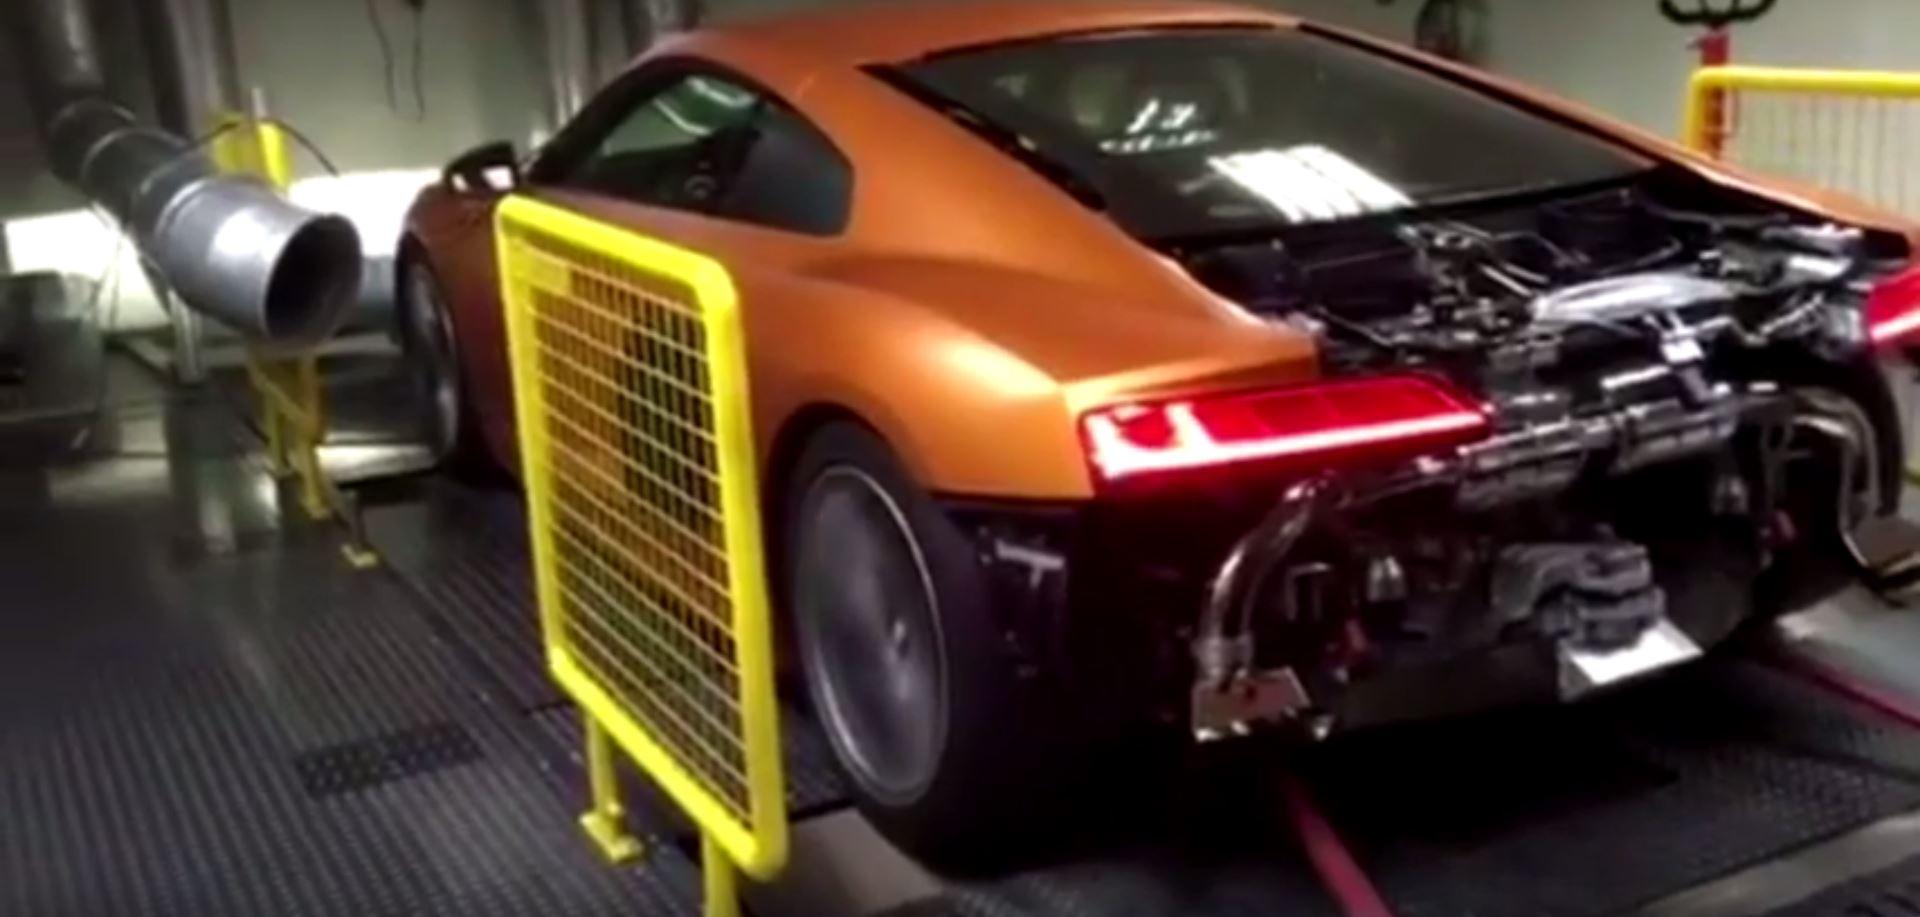 2017 Audi R8 V10 Gets Capristo Exhaust Dynos At 630 Hp Autoevolution